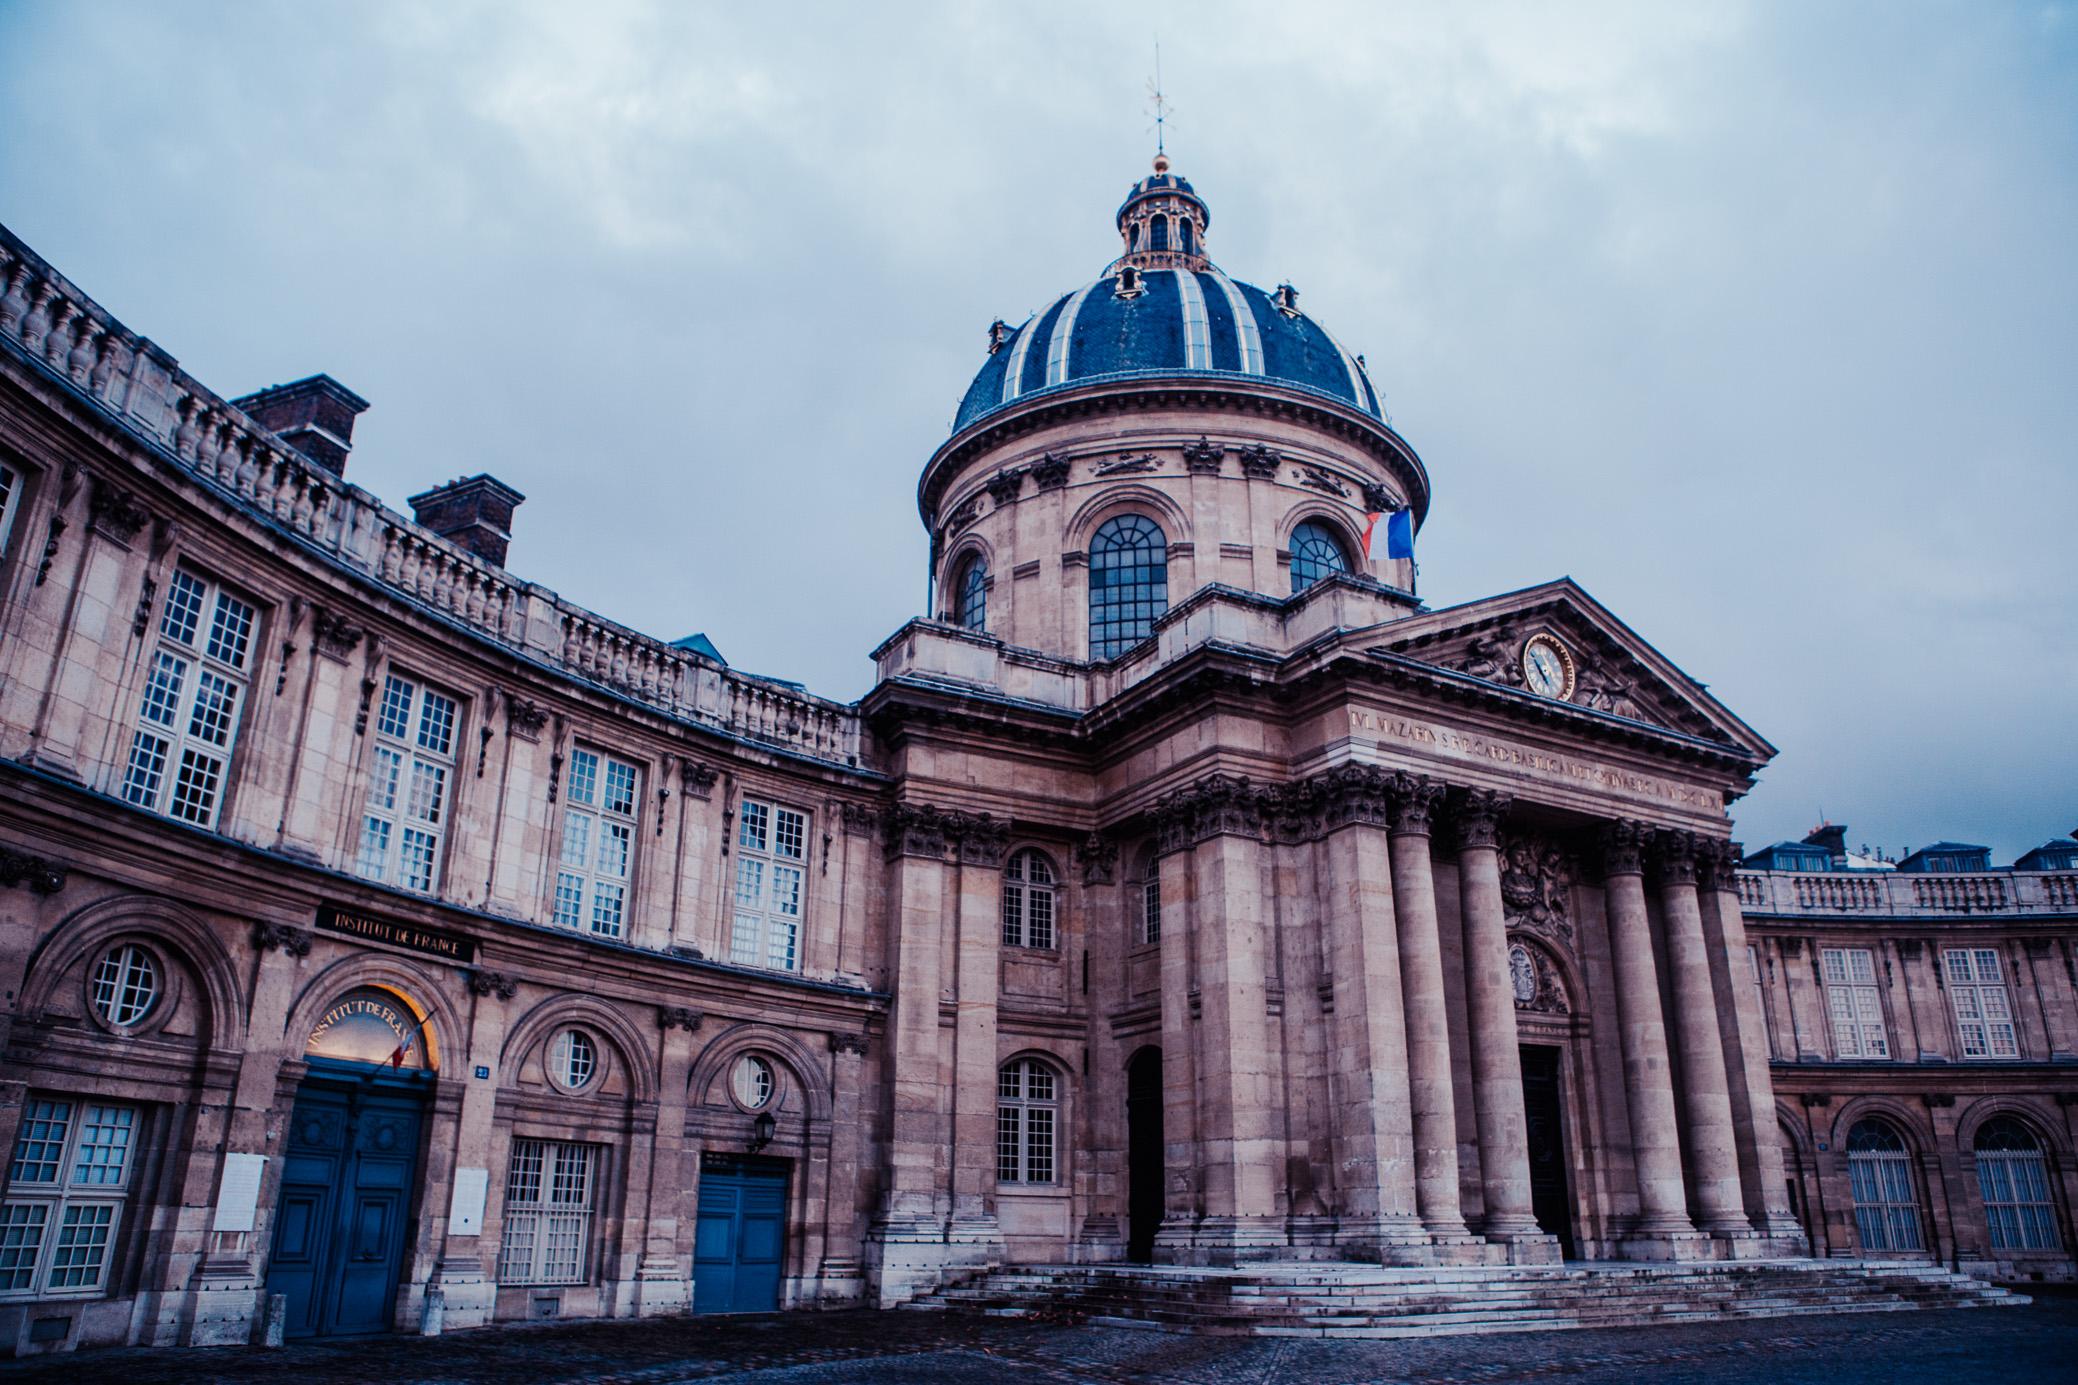 Institut de France | Paris, France | December 10th, 2018 | (Photo by David A. Smith / DSmithScenes)